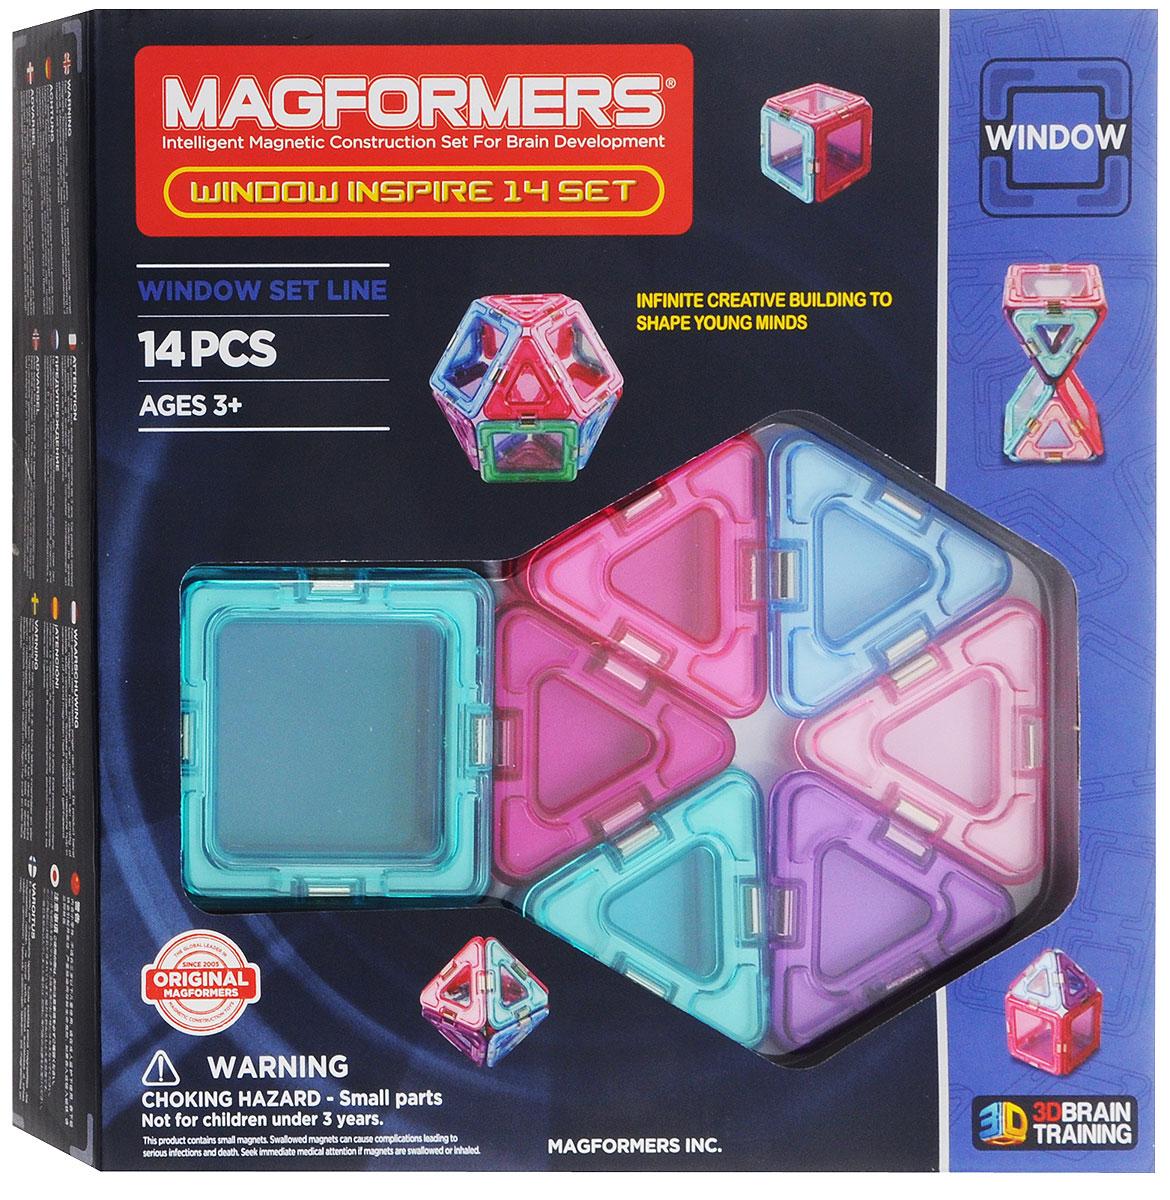 Magformers Магнитный конструктор Window Inspire Set 14 магнитный конструктор magformers window inspire 30 set 714004